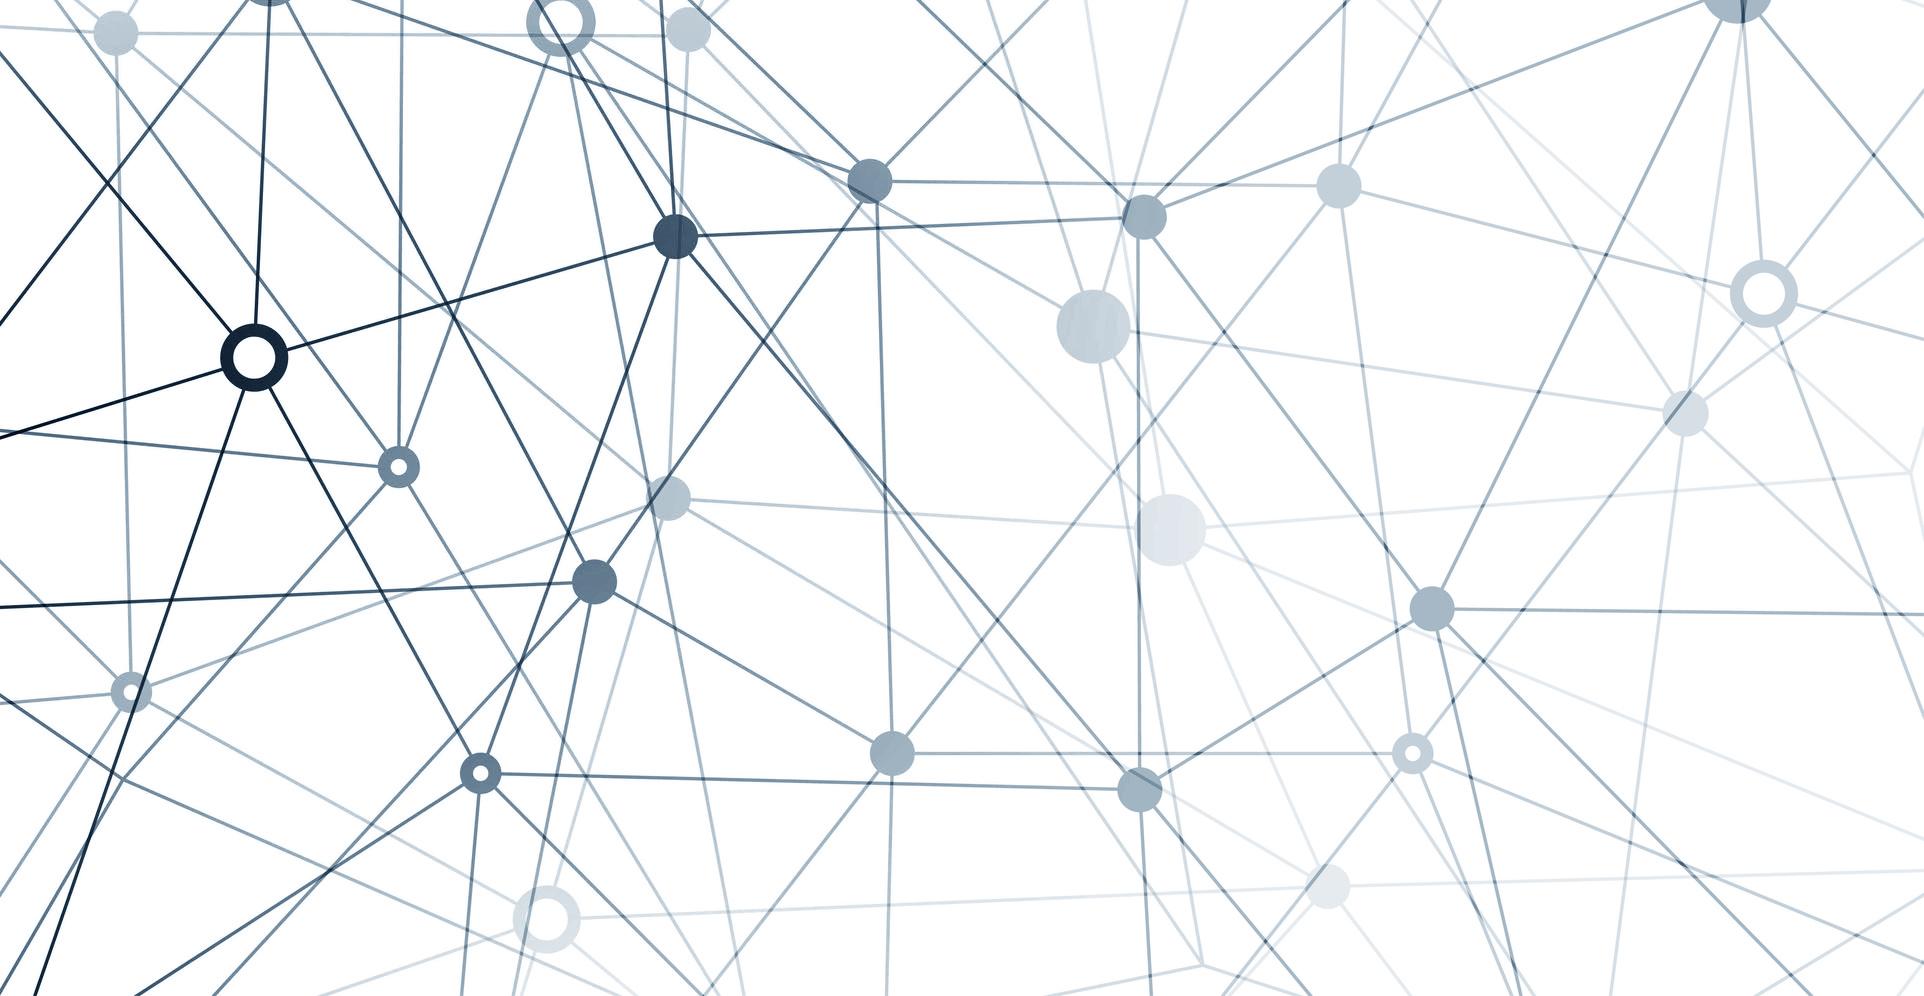 NAT-Network-automotive-triveneto-rete-aziende-auto_crop-grey-1